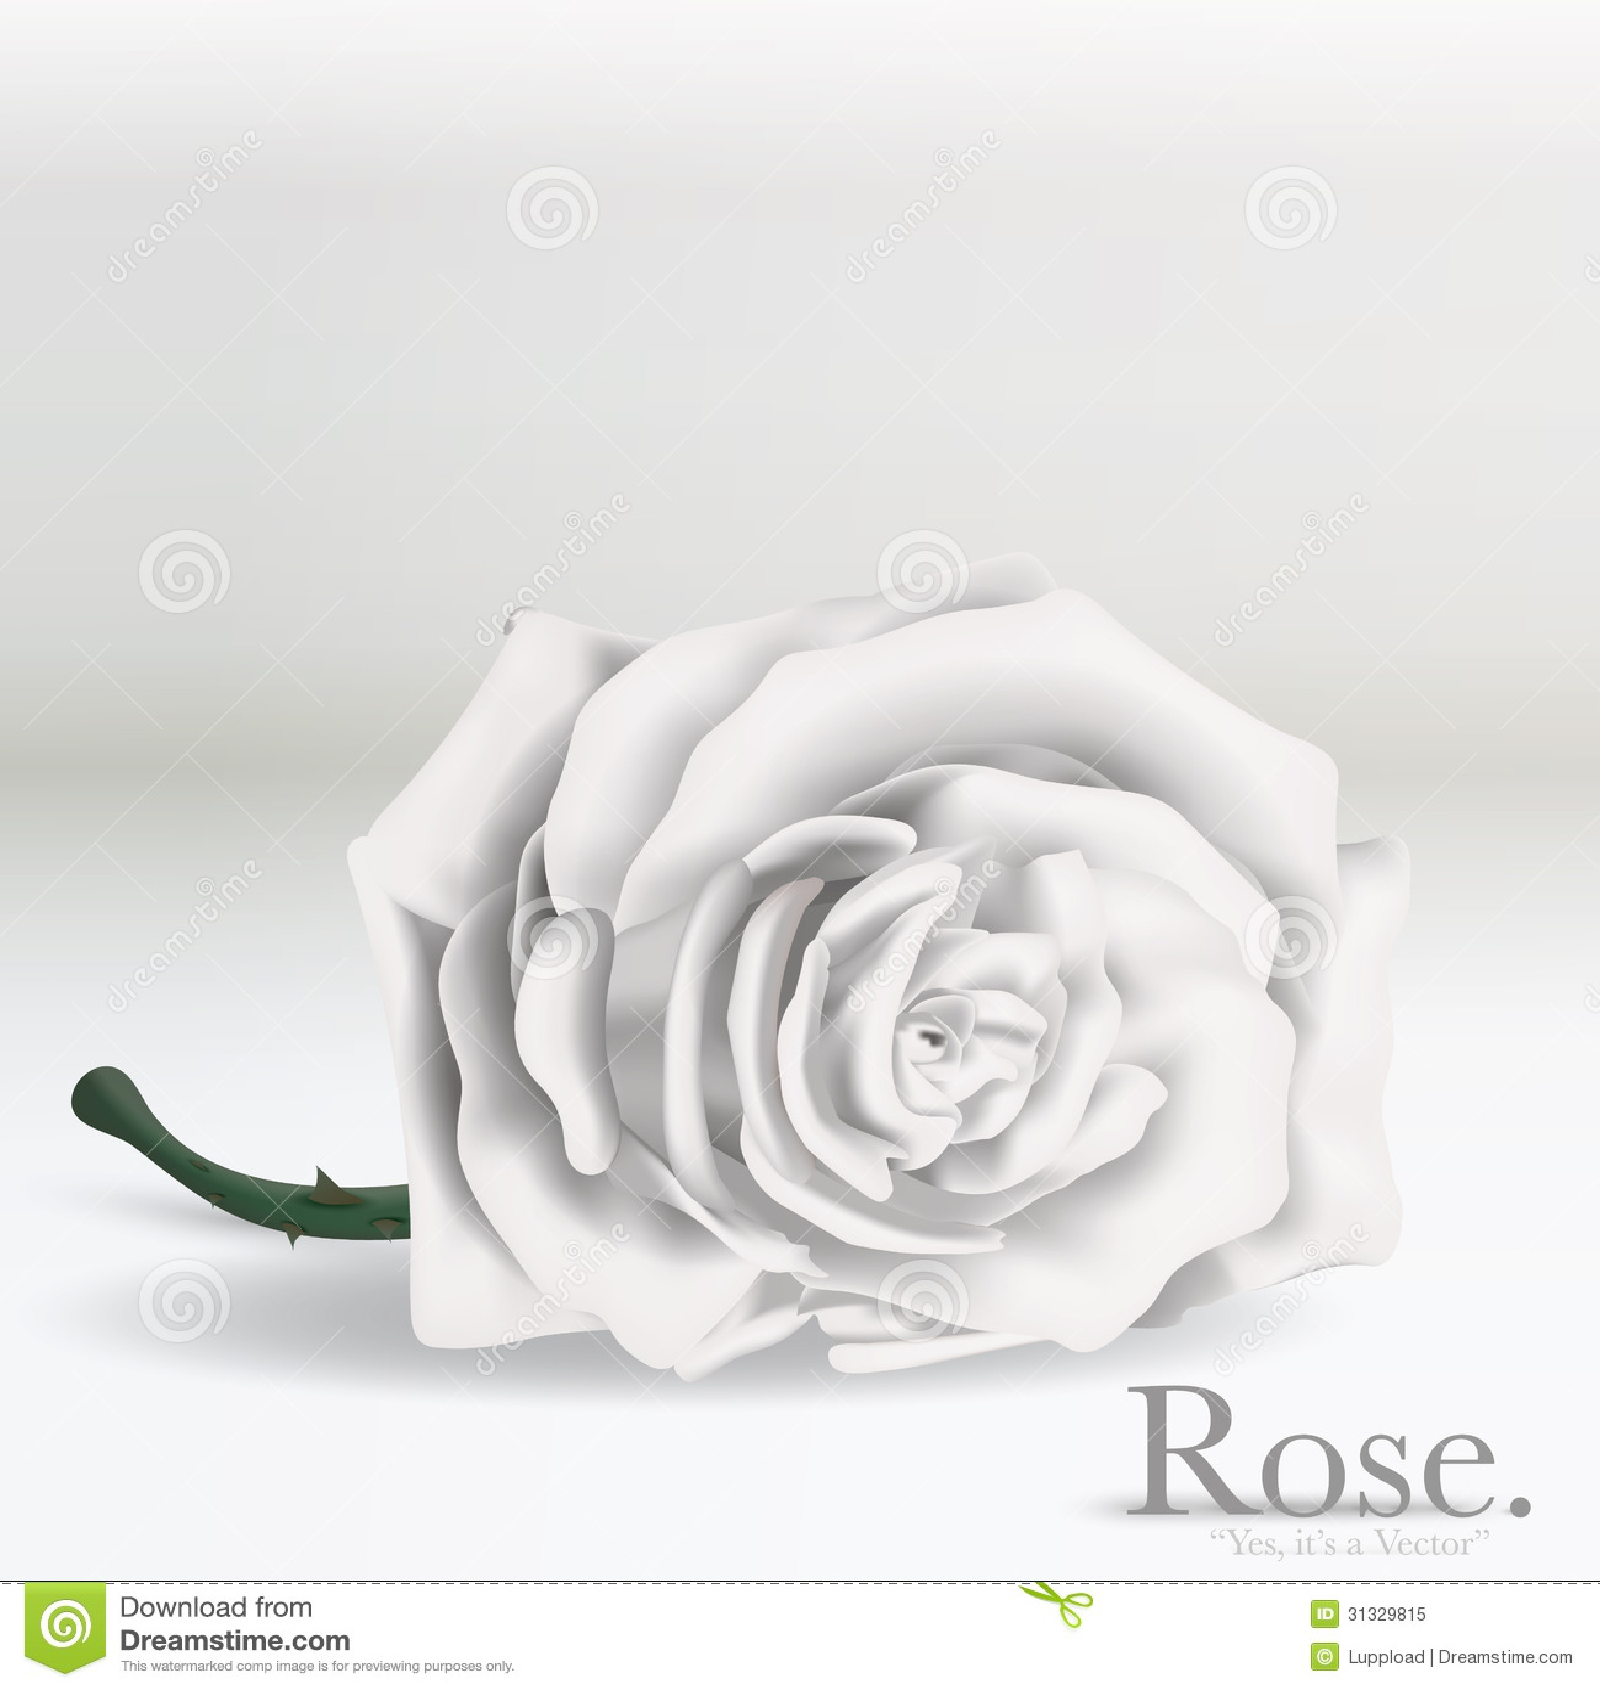 White Vector Rose Flower On Background Stock Vector - Illustration of gift, beautiful: 31329815